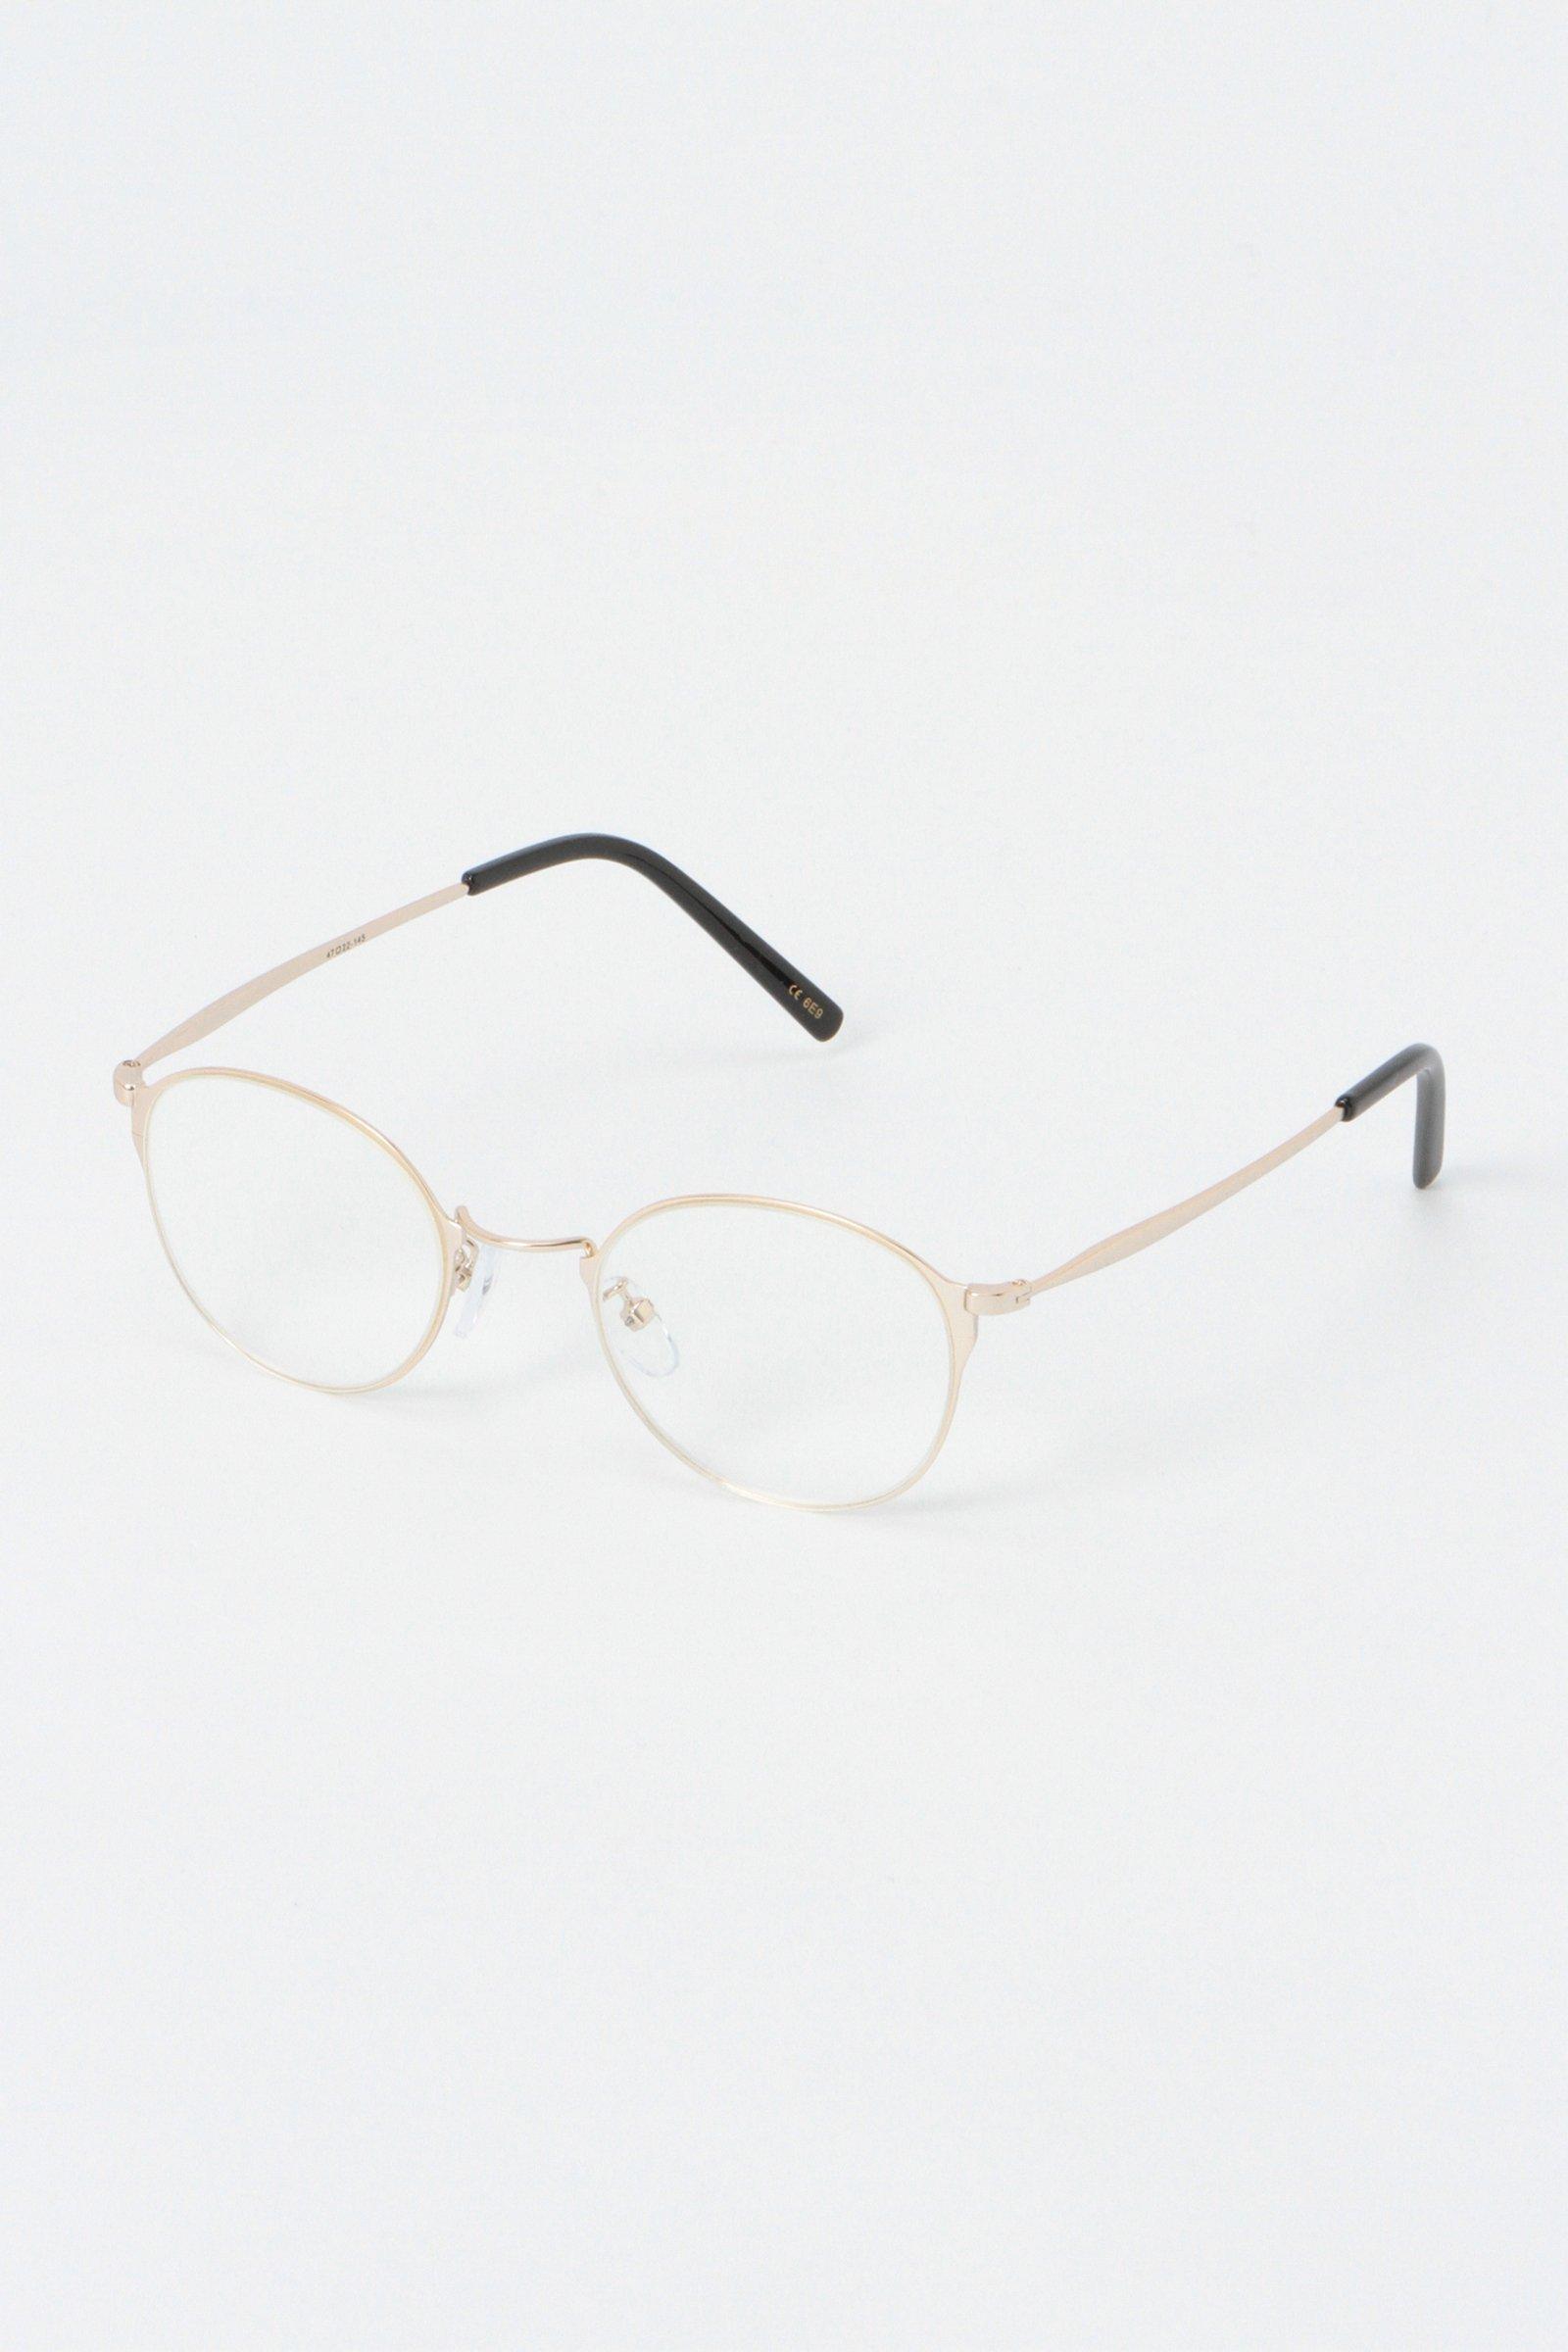 rakuten brand avenue Oakley Half Jacket 2.0 Sunglasses resa 08